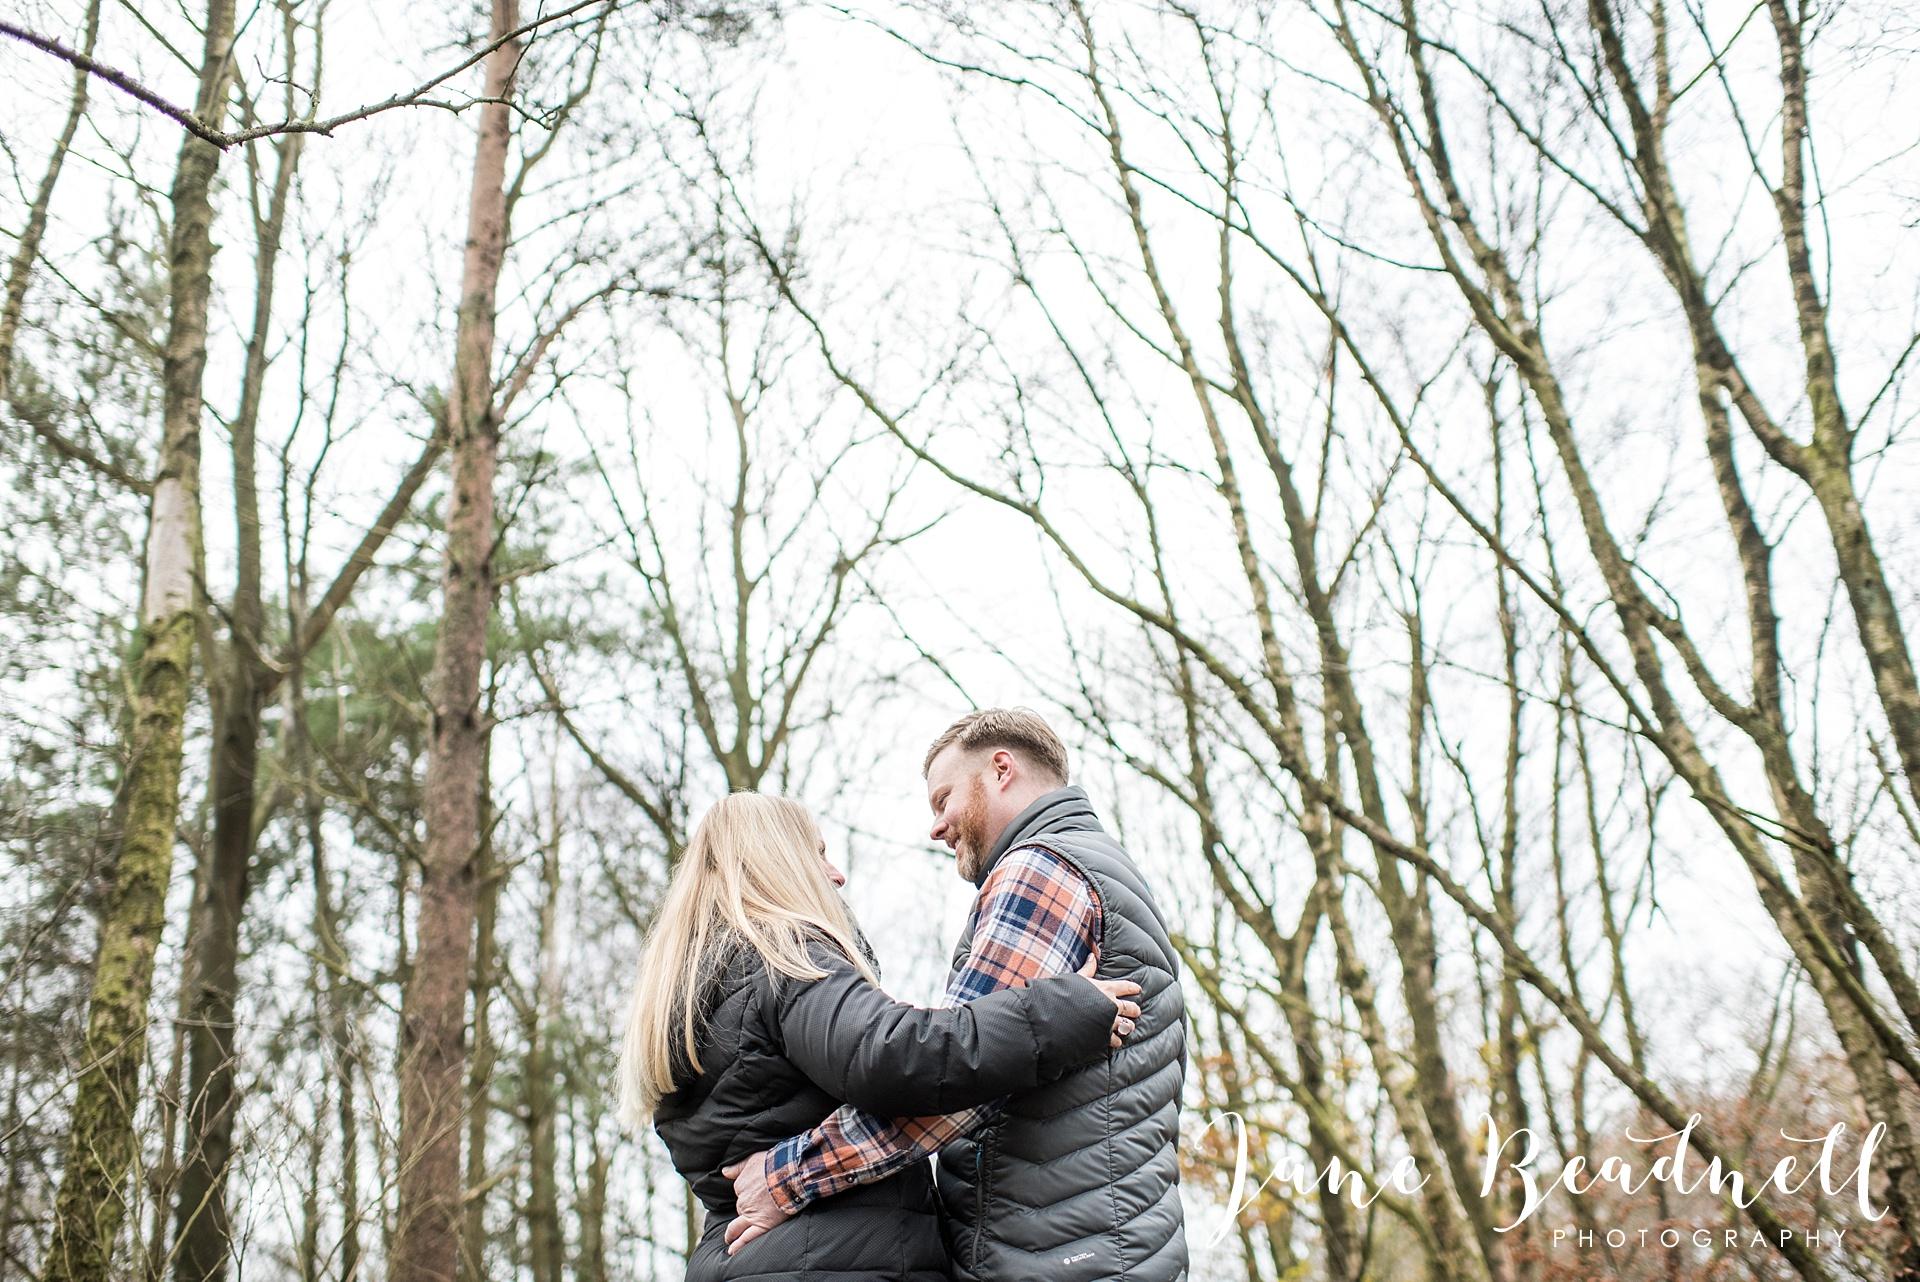 yorkshire-wedding-photographer-jane-beadnell-photography-uk-and-destination-wedding-photographer-engagement-shoot_0018